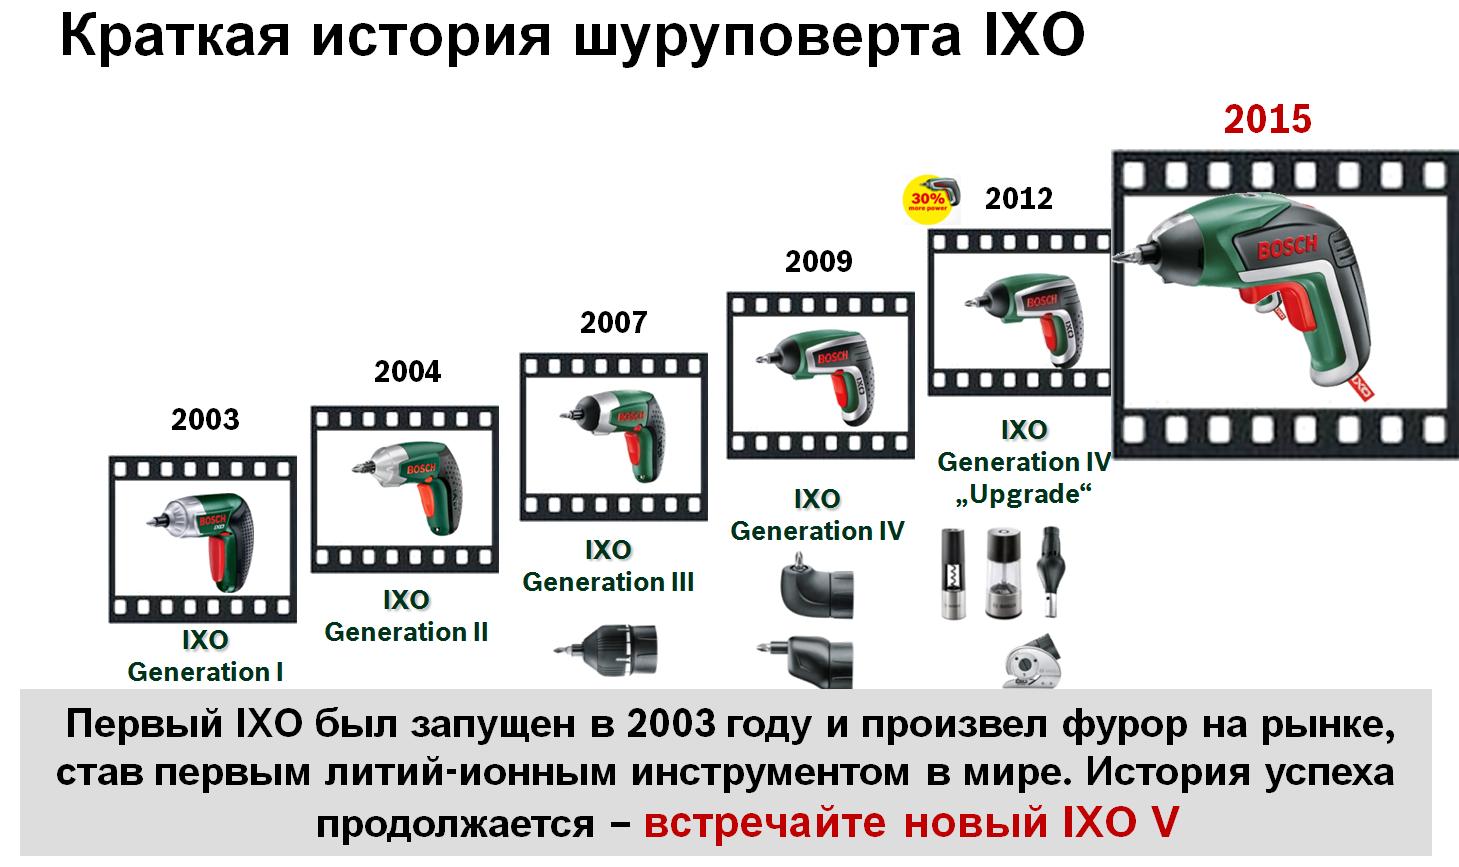 История IXO 5